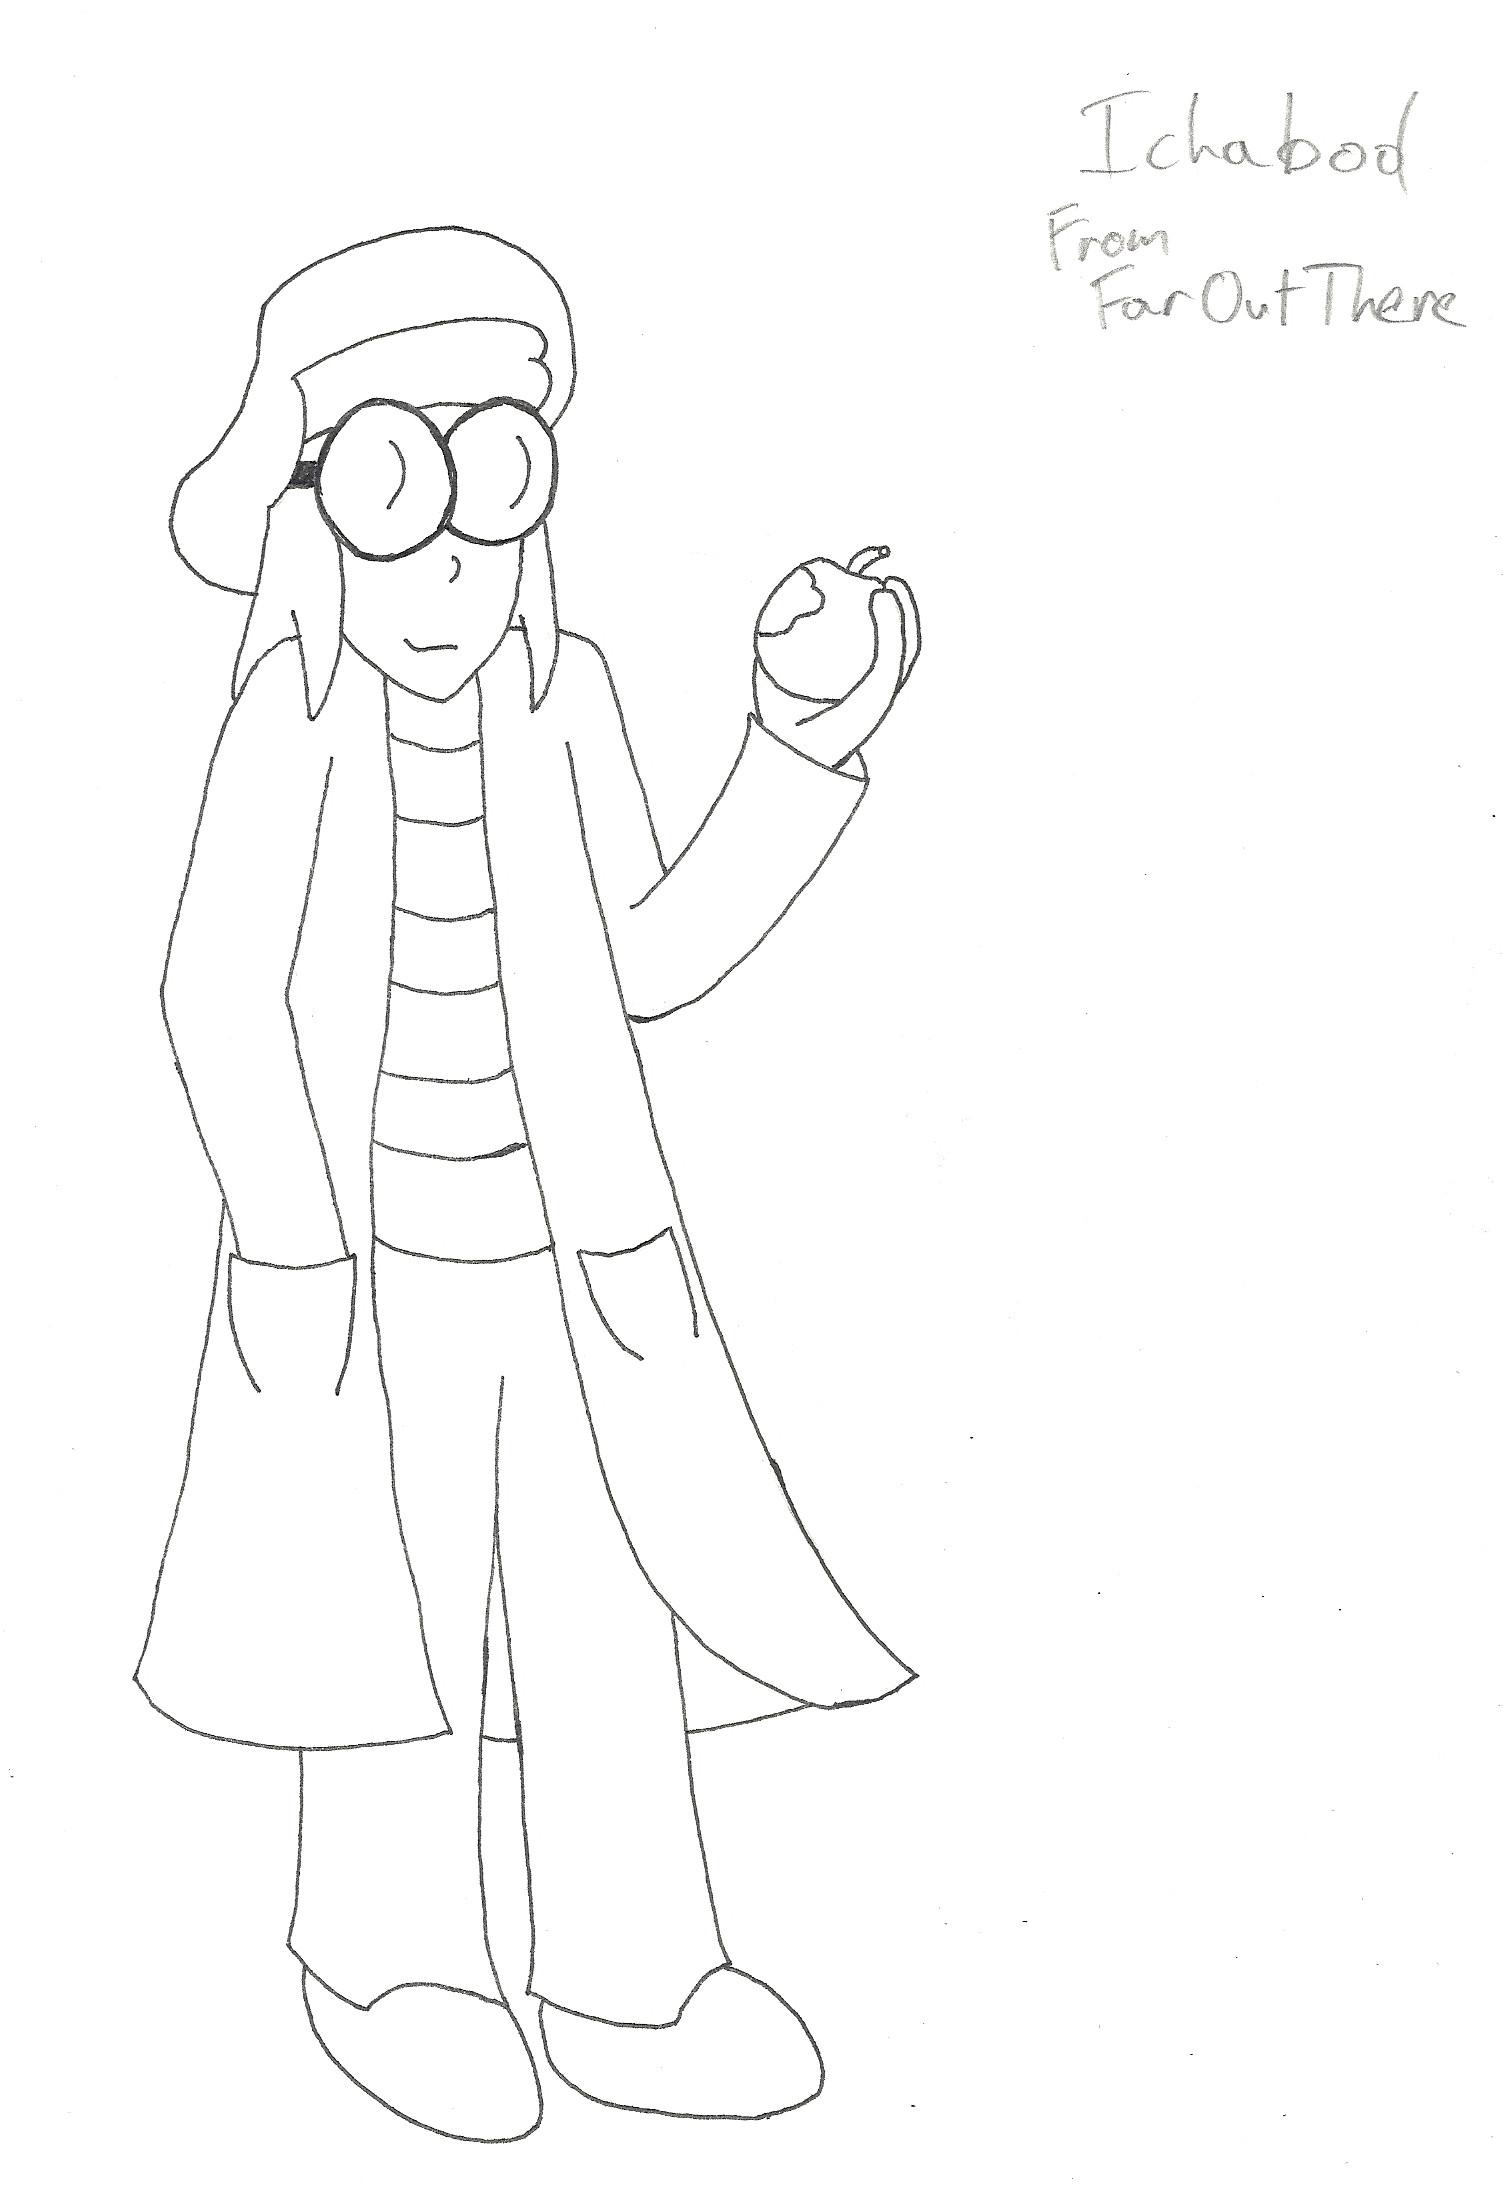 Ichabod drawing 0001 scan.jpg